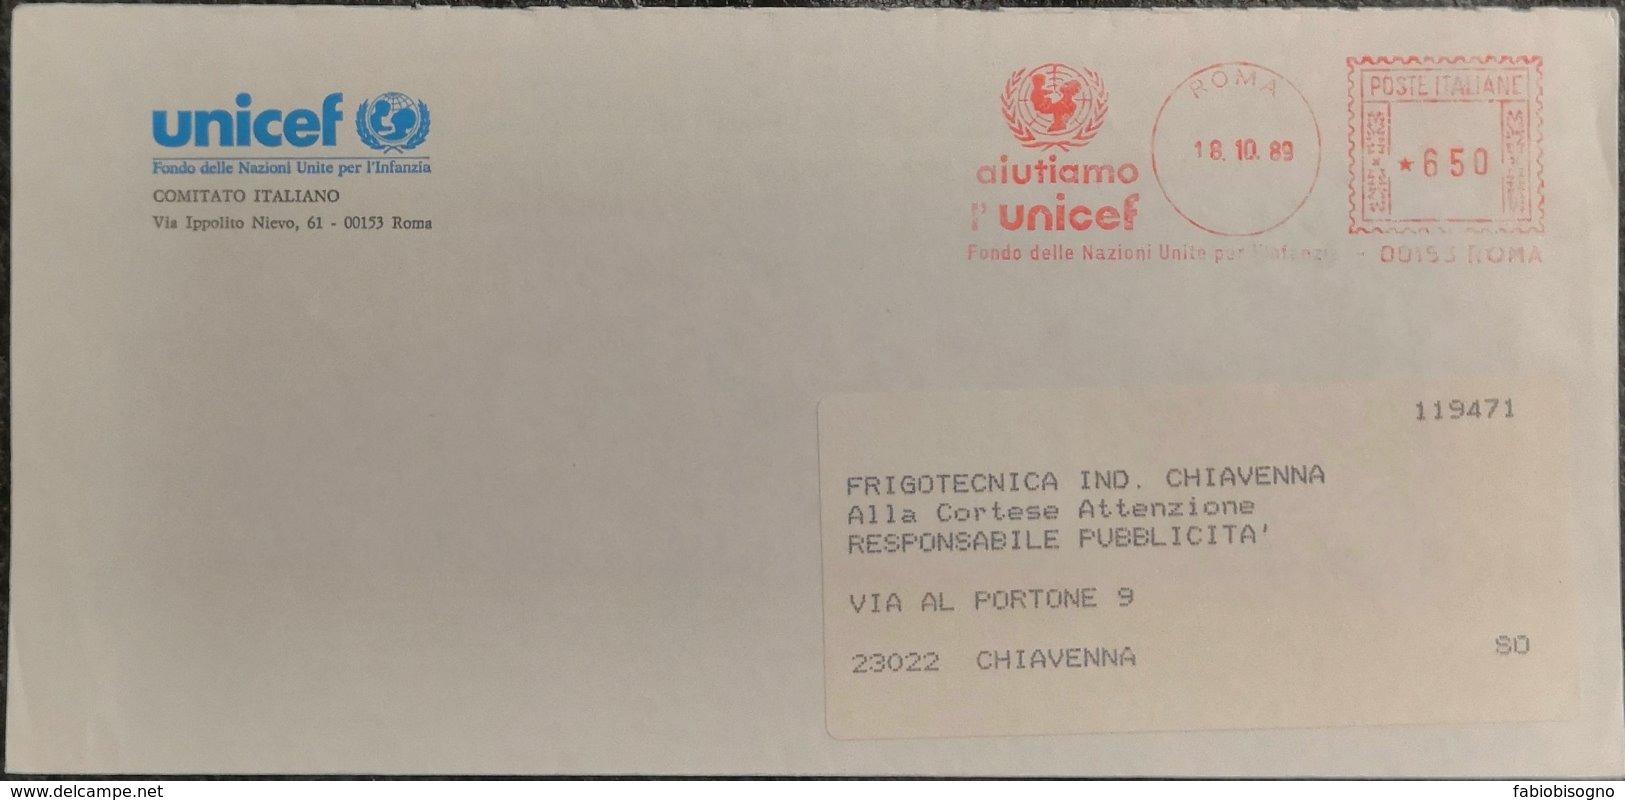 1989 Italy - Aiutiamo L' UNICEF 650 EMA Meter -  Used Stamp On Cover To Italy - Contro La Fame